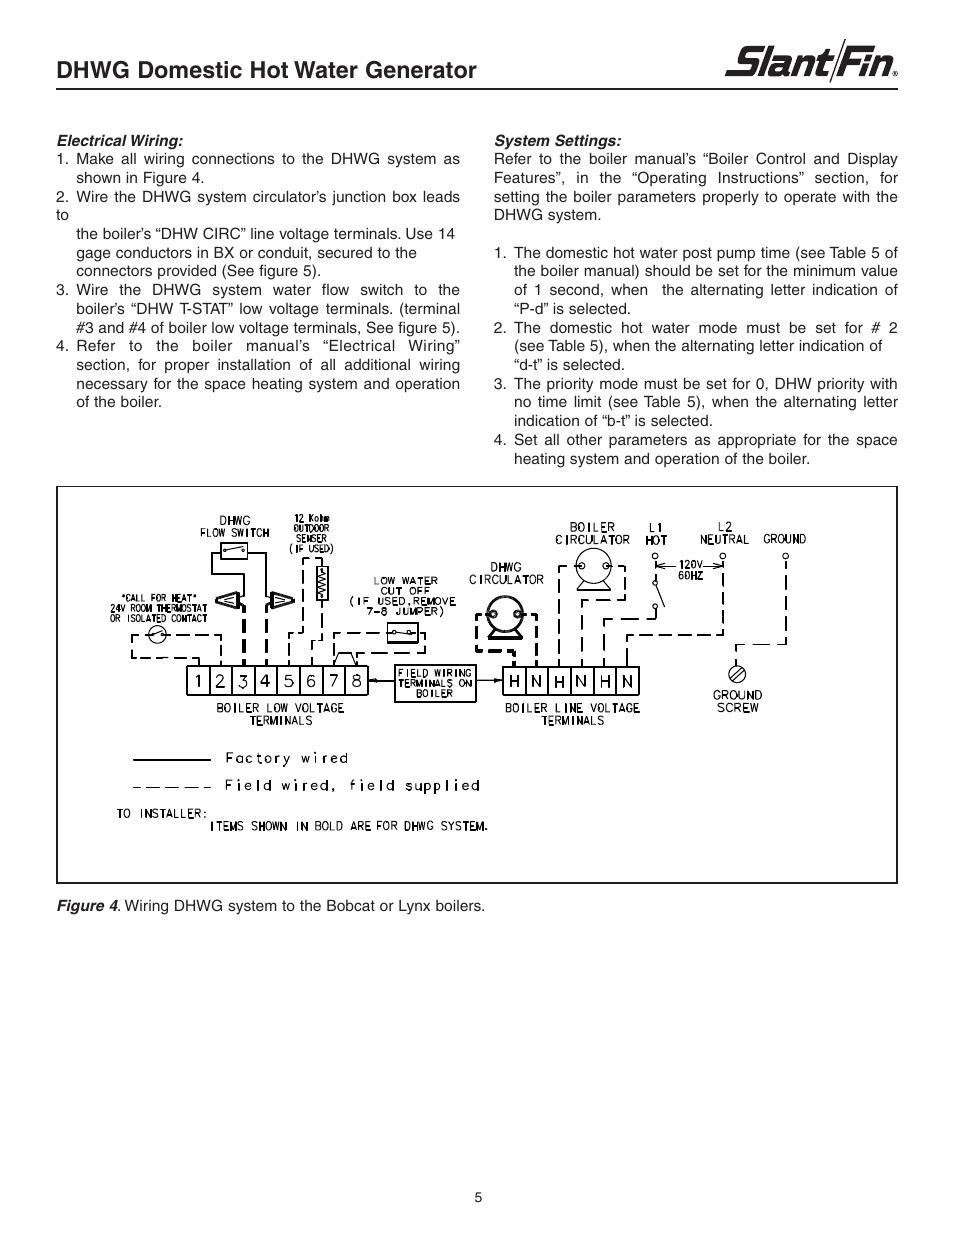 Dhwg Domestic Hot Water Generator Slant Fin User Manual Boiler Wiring Diagram Page 5